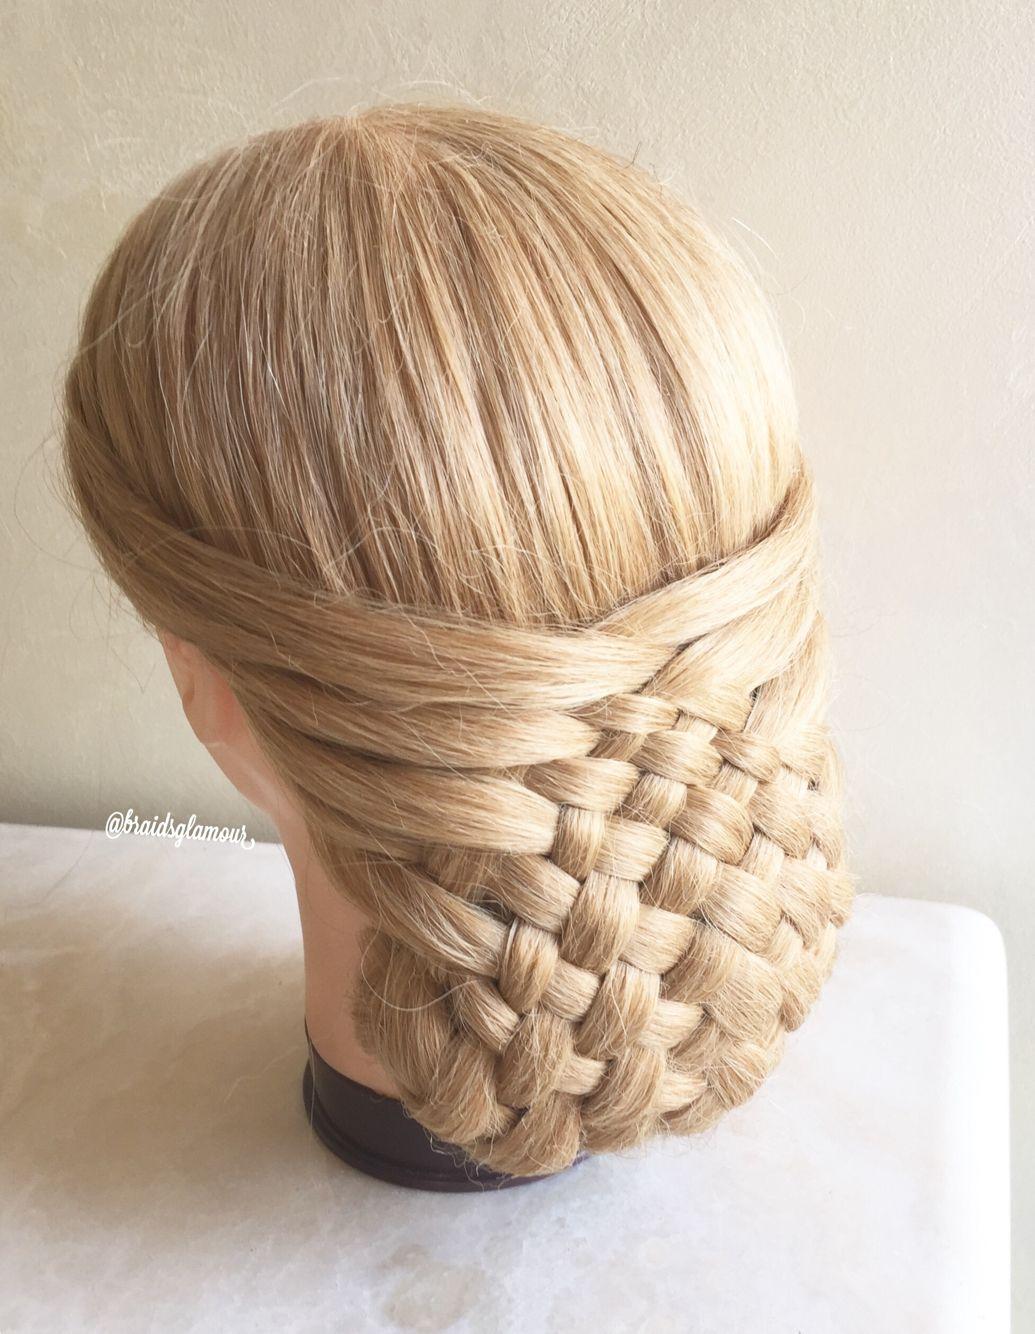 Woven updo feeftechnieken pinterest updo hair style and braid